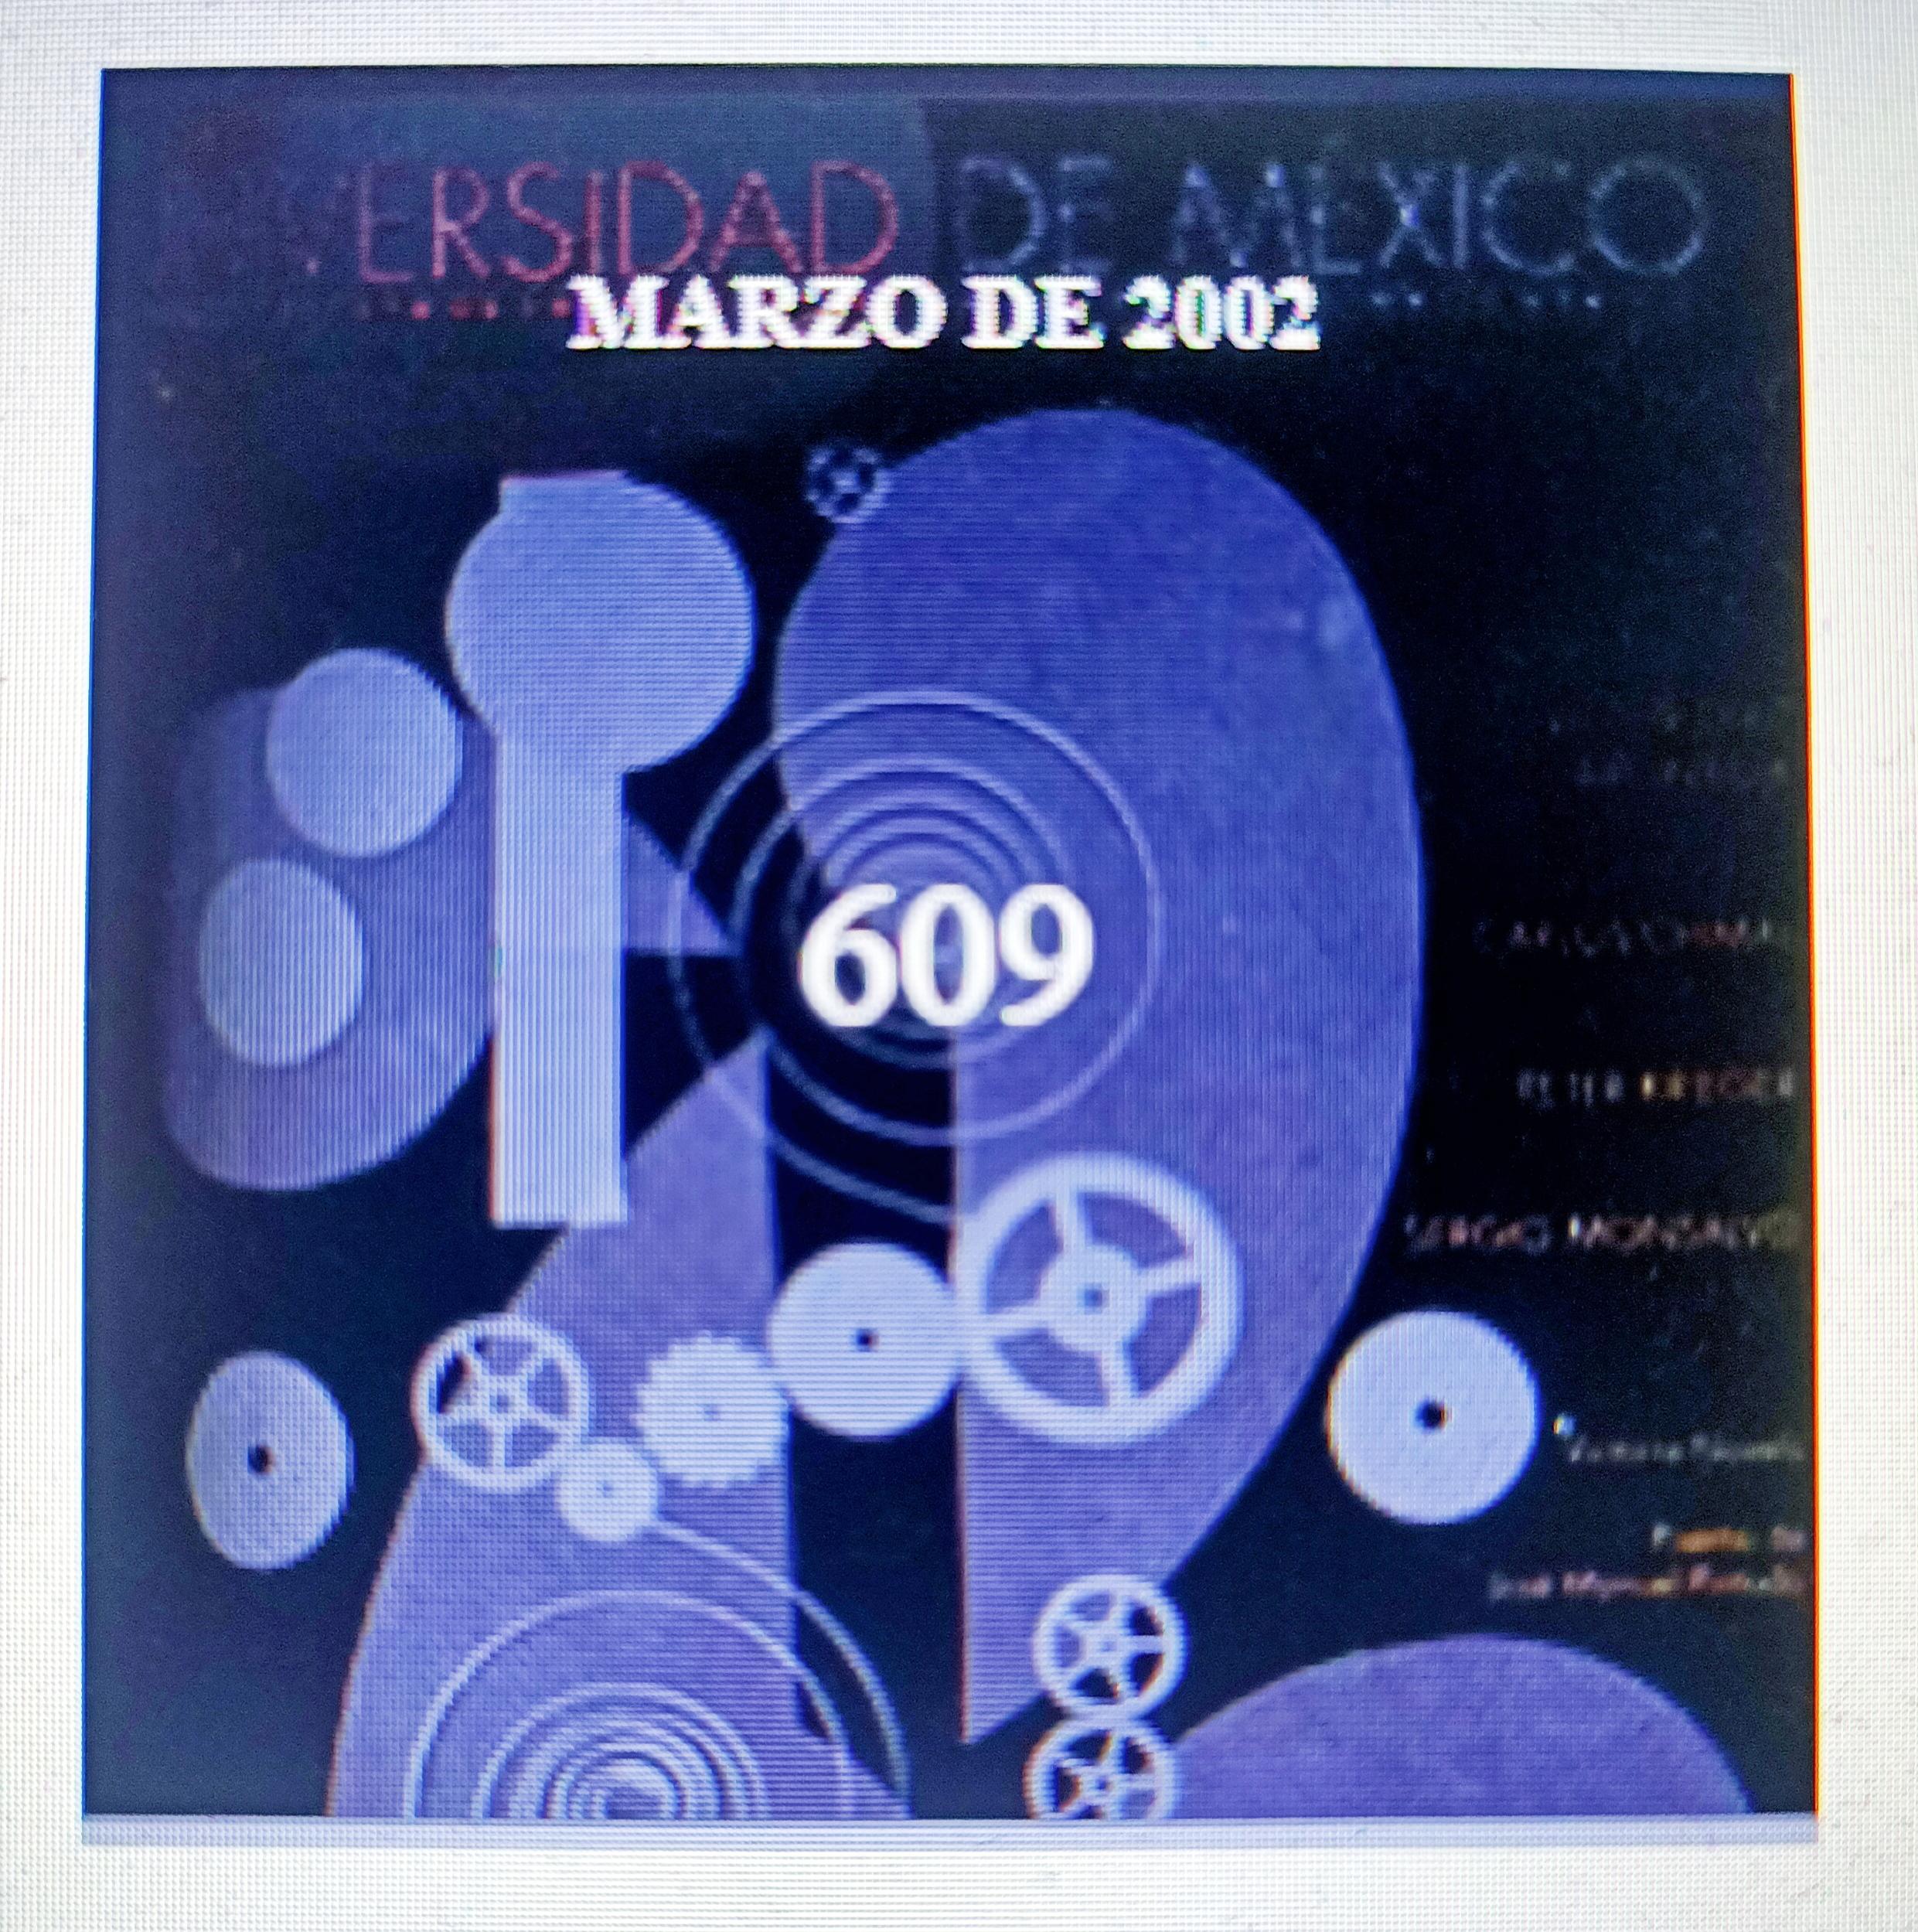 MARZO 2002